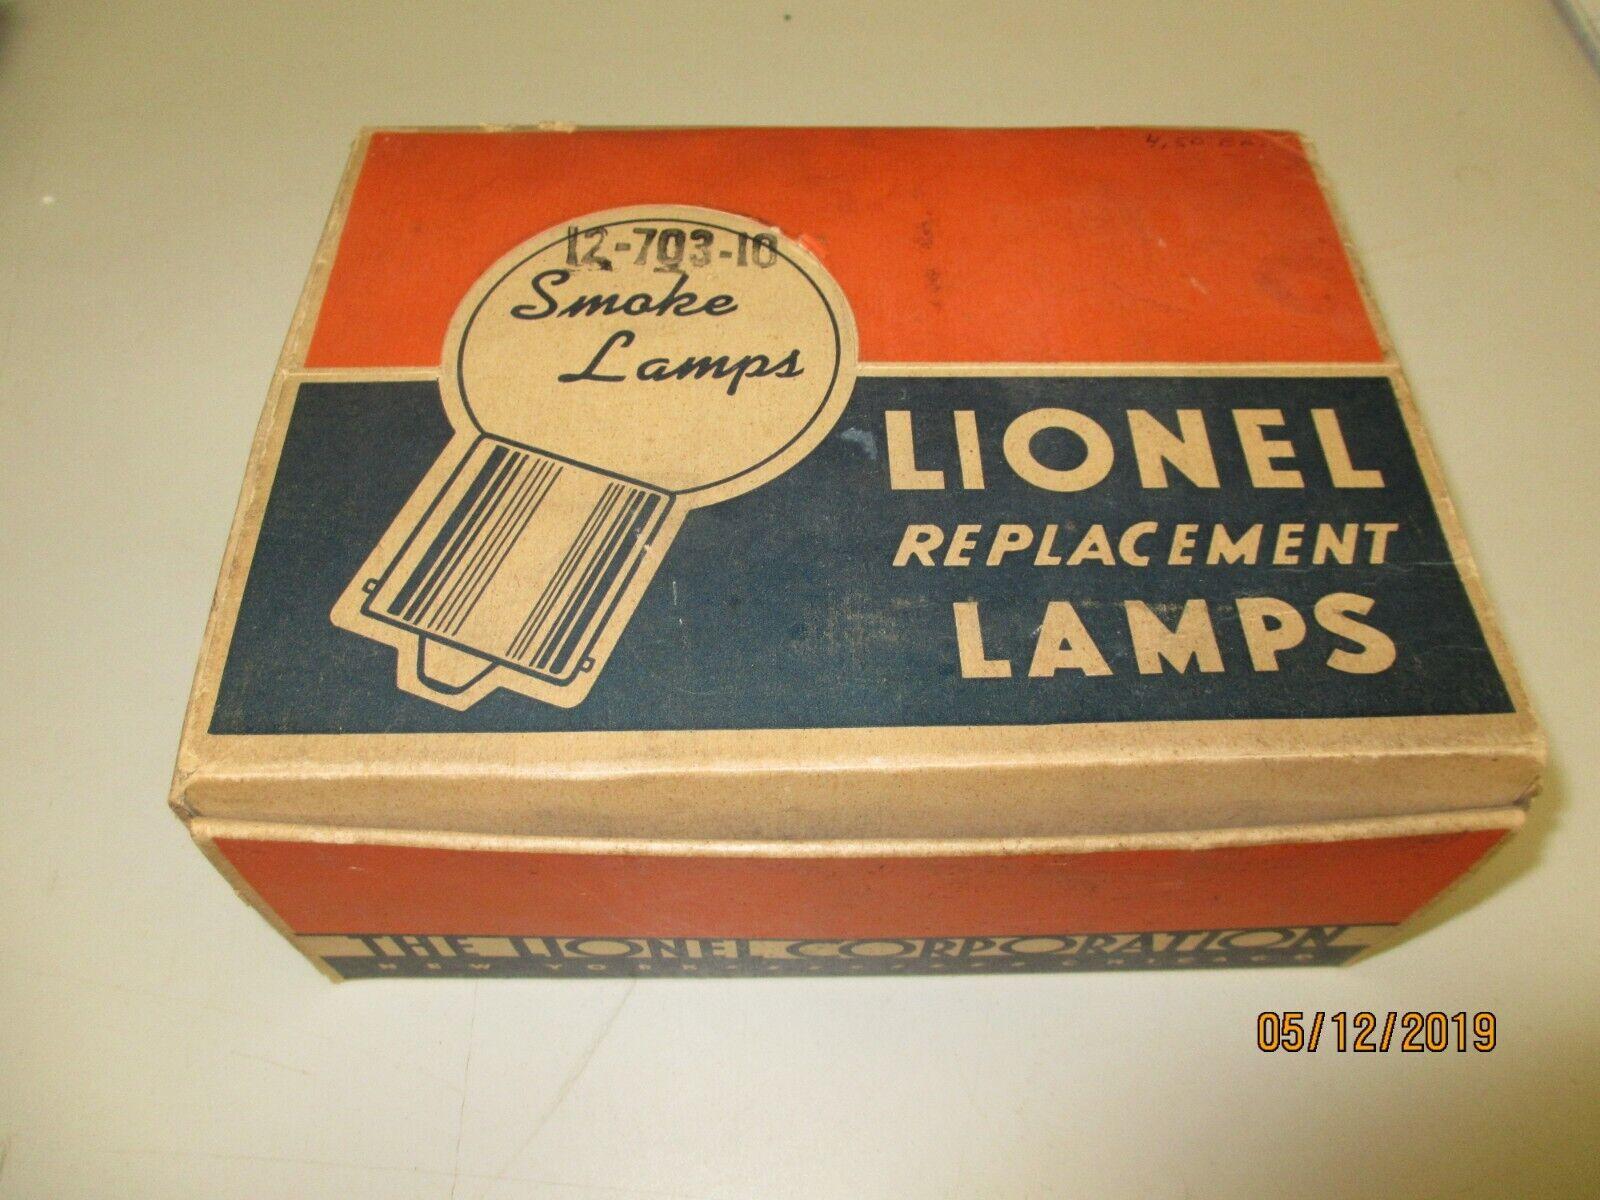 Lionel 12-703-10 Full Box (12) Smoke Lamps OB